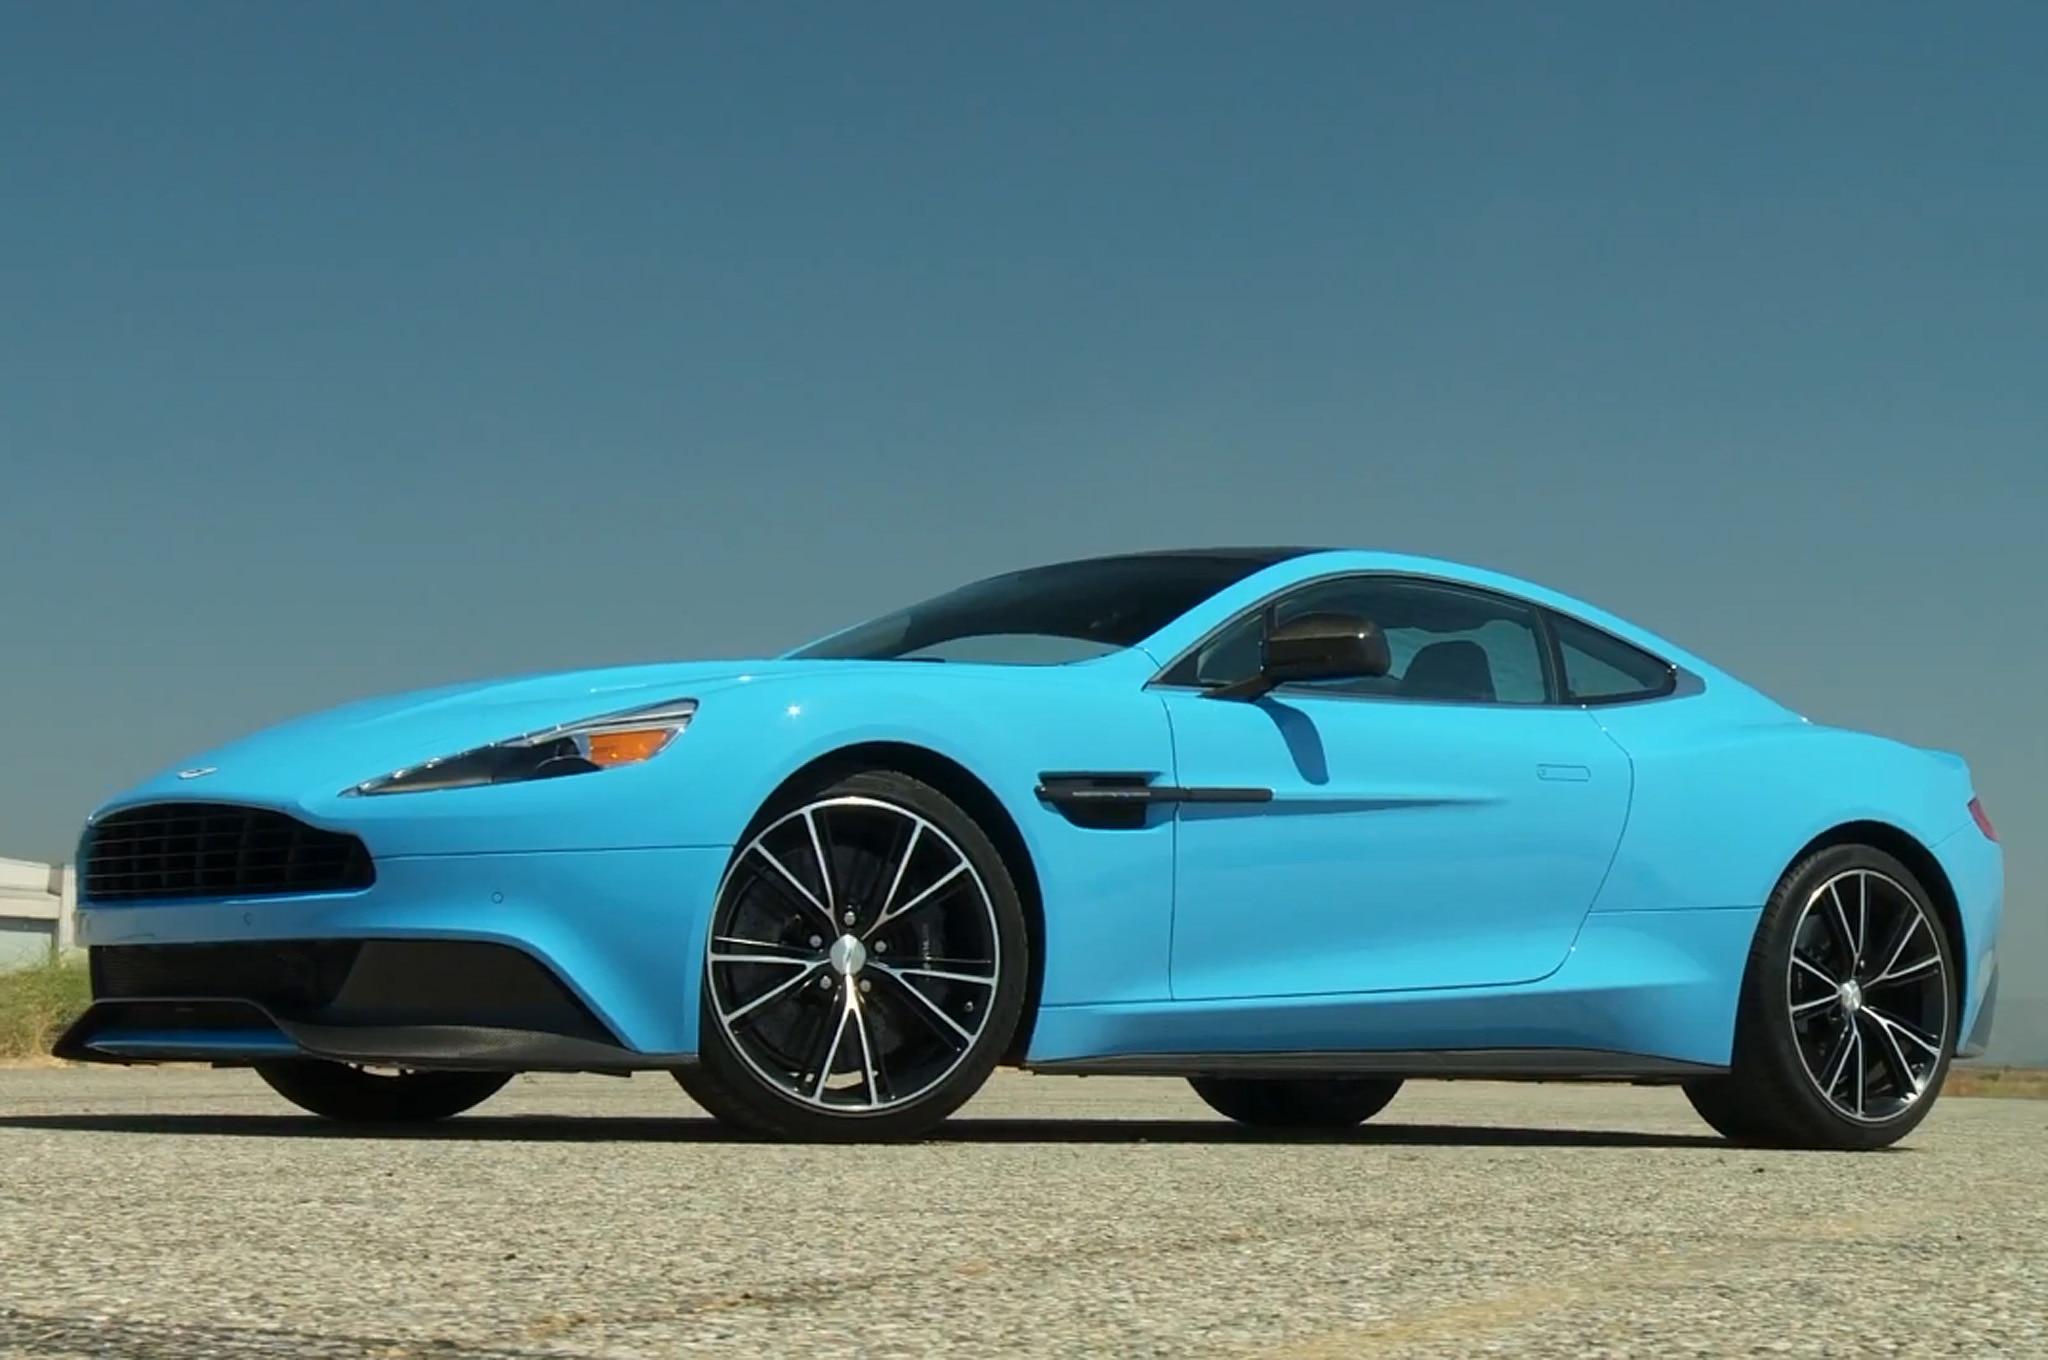 Aston Martin Vanquish Top Speed Ingilizceegzersizcom - Aston martin cargurus